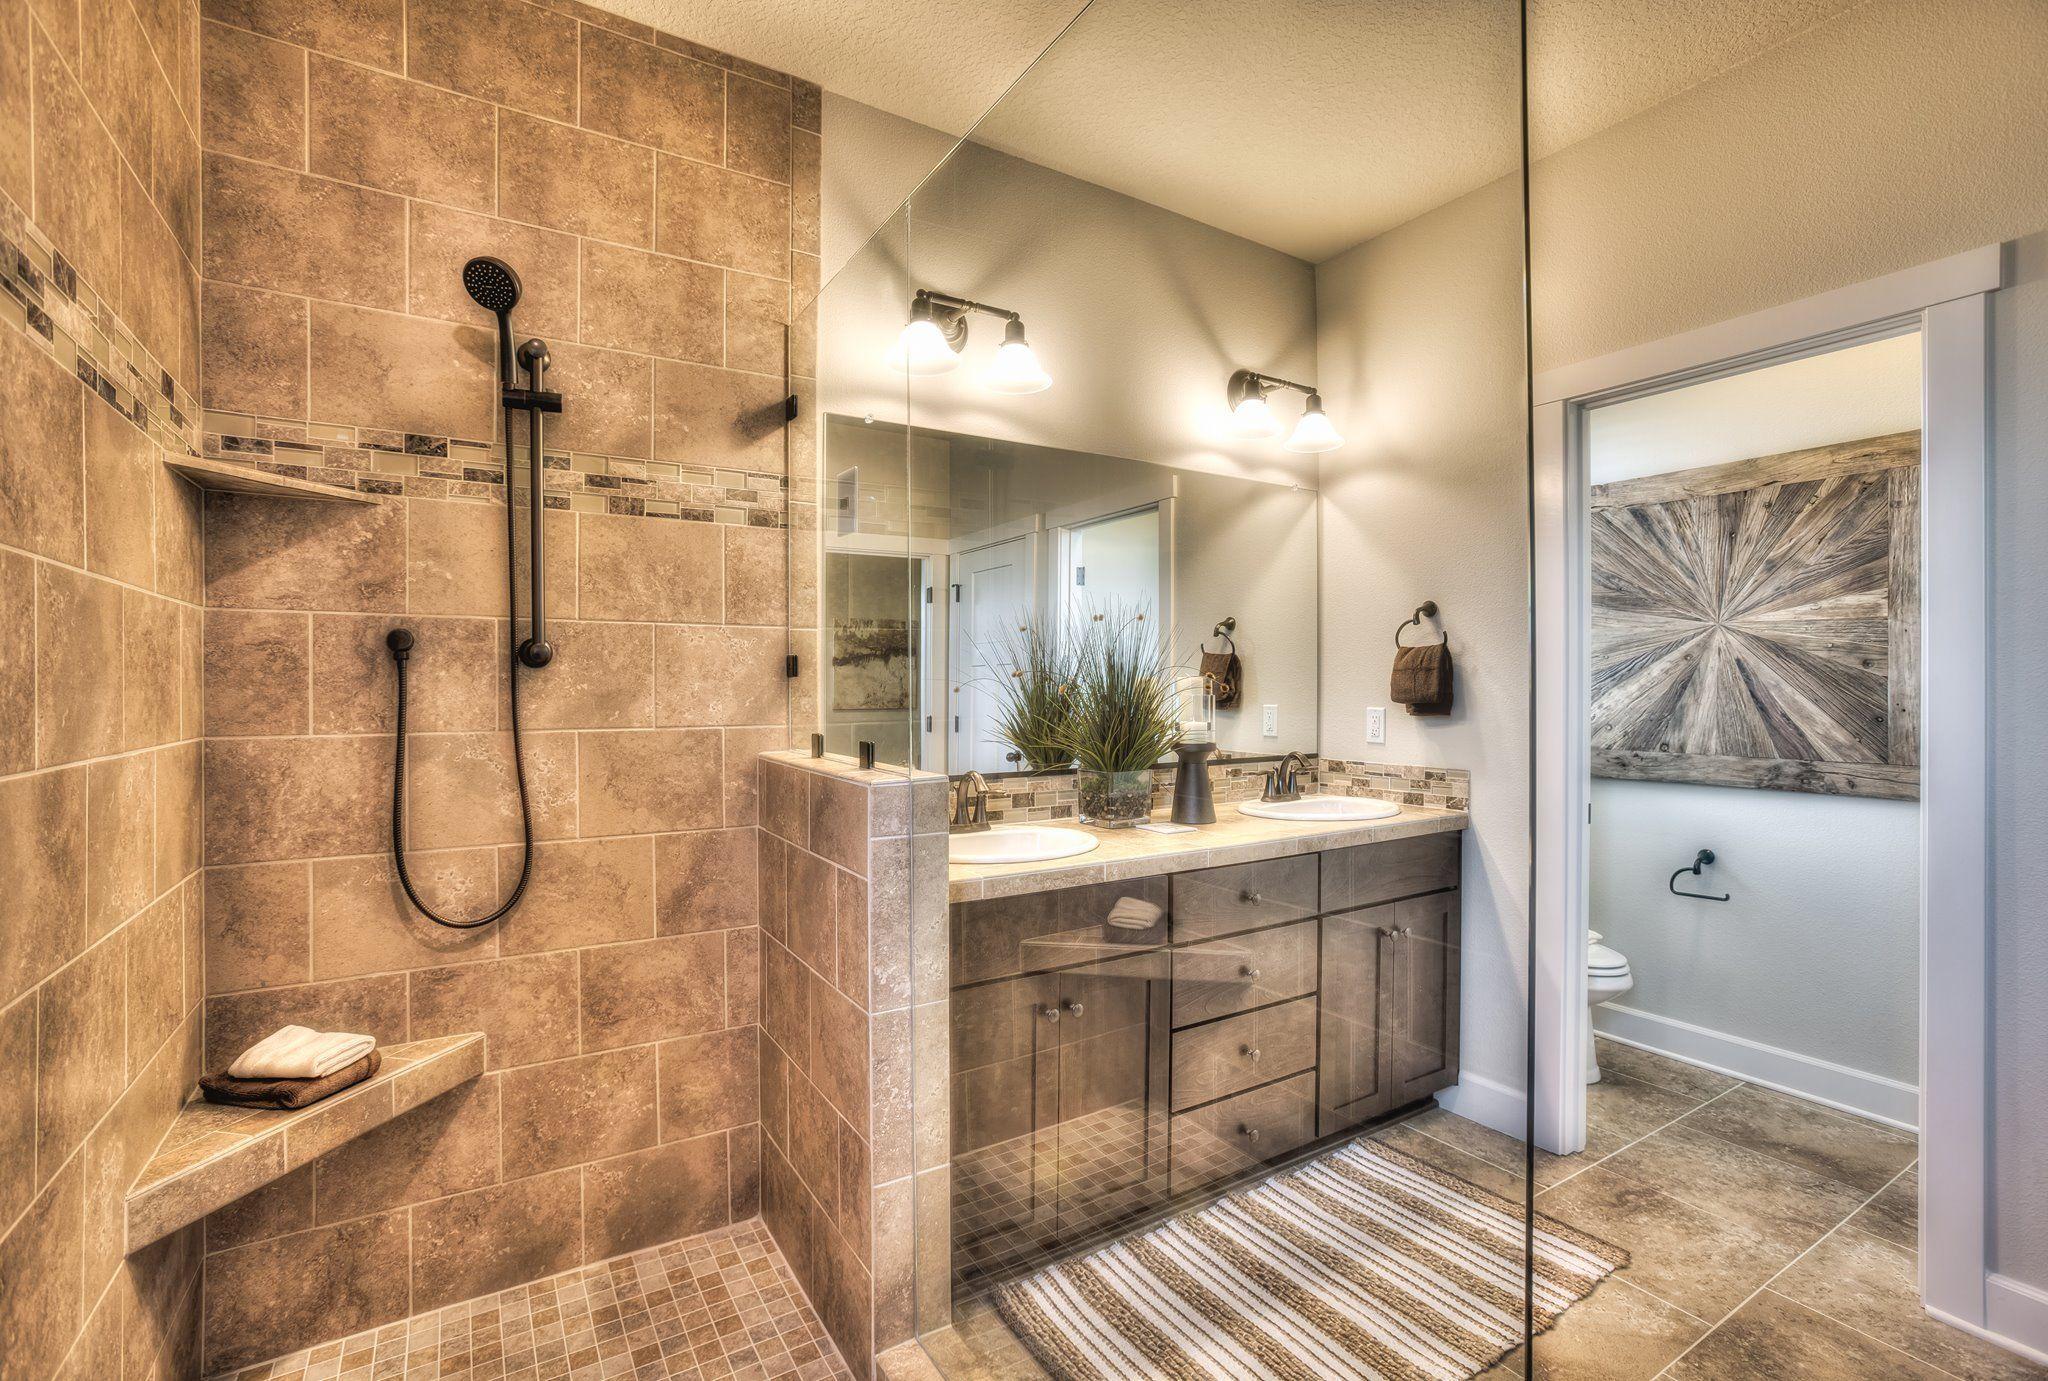 Does This Bathroom Have SHOWER POWER Bathroom Remodel Ideas - Bathroom remodel arvada